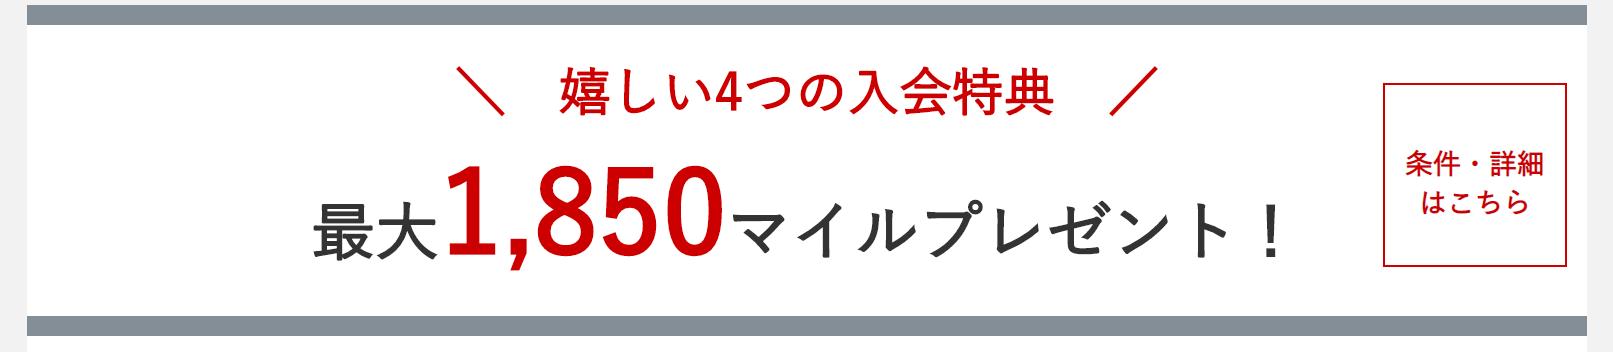 JALカードSuicaのキャンペーン